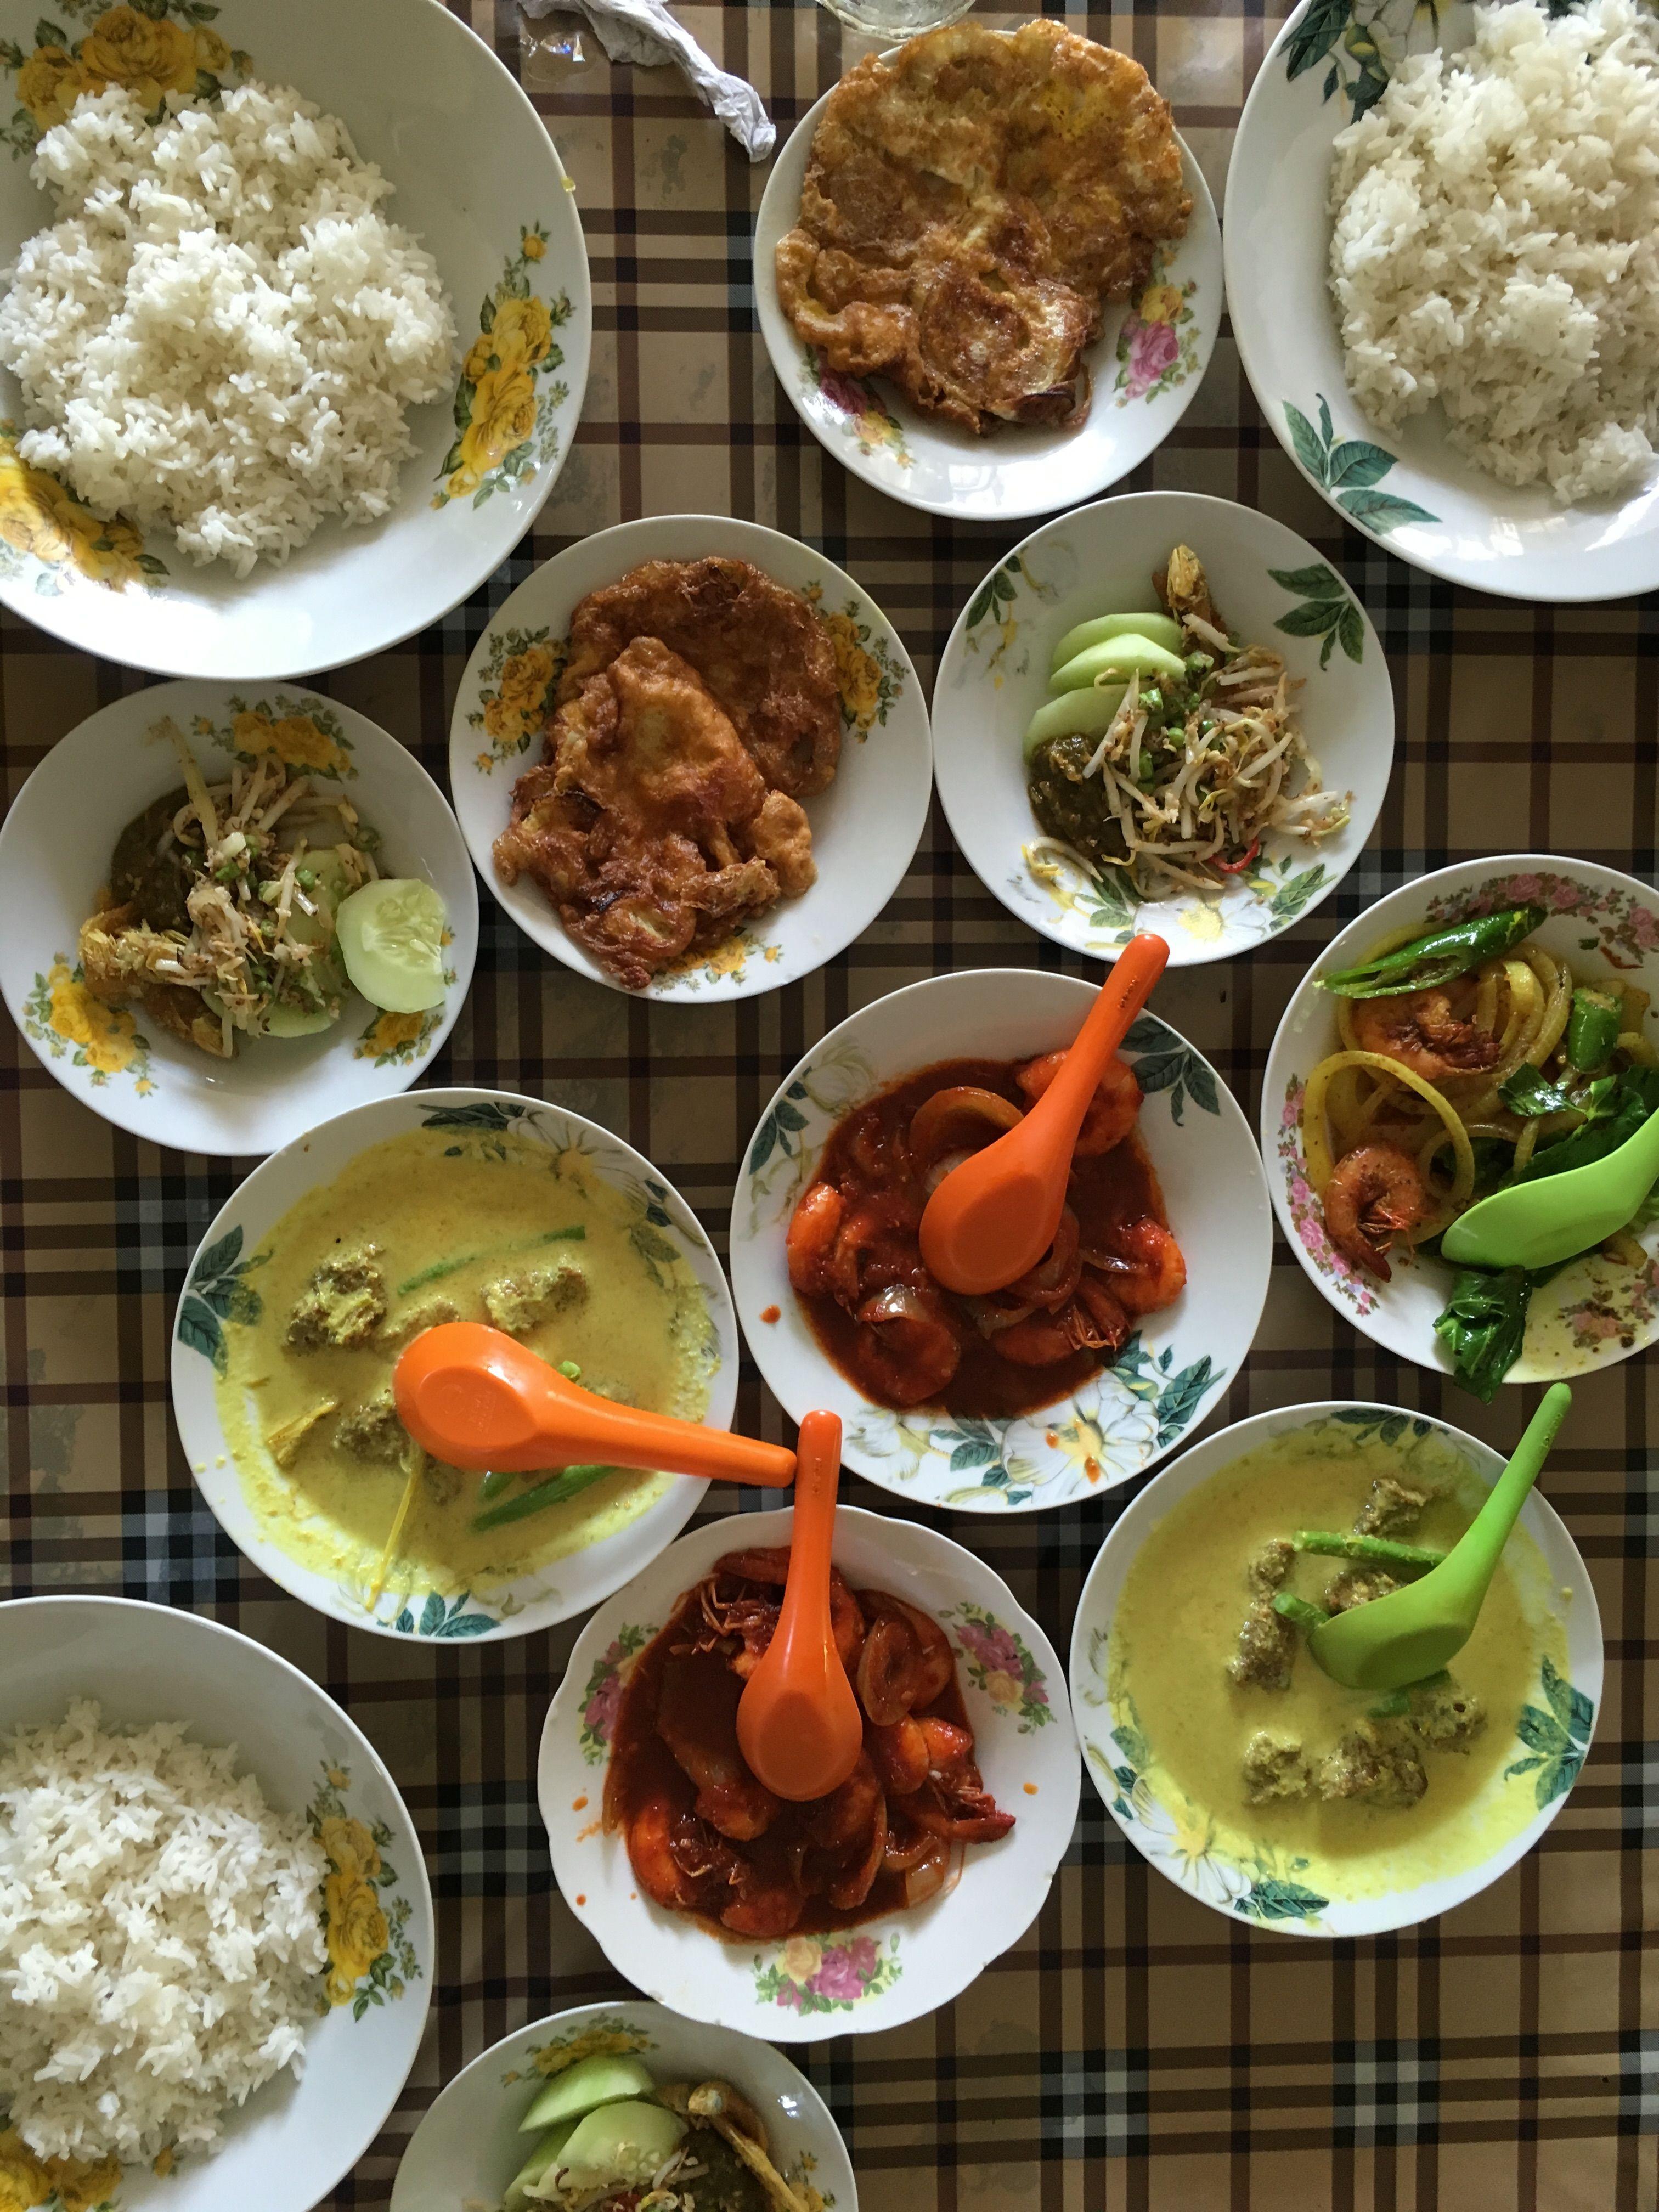 A typical malay dish sambal udang prawn daging salai masak a typical malay dish sambal udang prawn daging salai masak lemak cili forumfinder Image collections